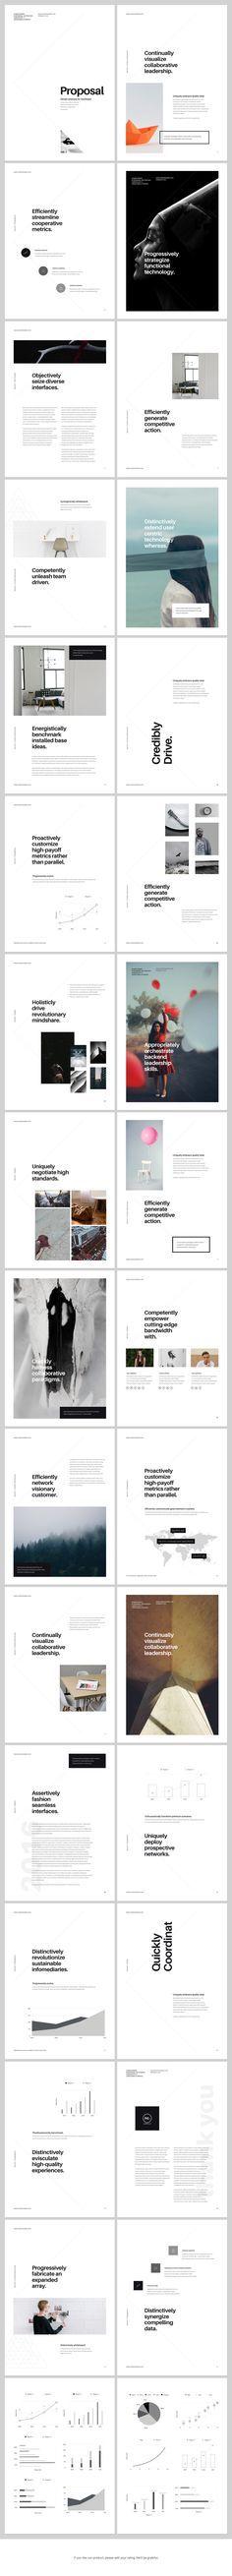 A4 Keynote Presentation for Print by GoaShape #design Download: https://creativemarket.com/GoaShape/525139-A4-Keynote-Presentation-for-Print?u=nexion